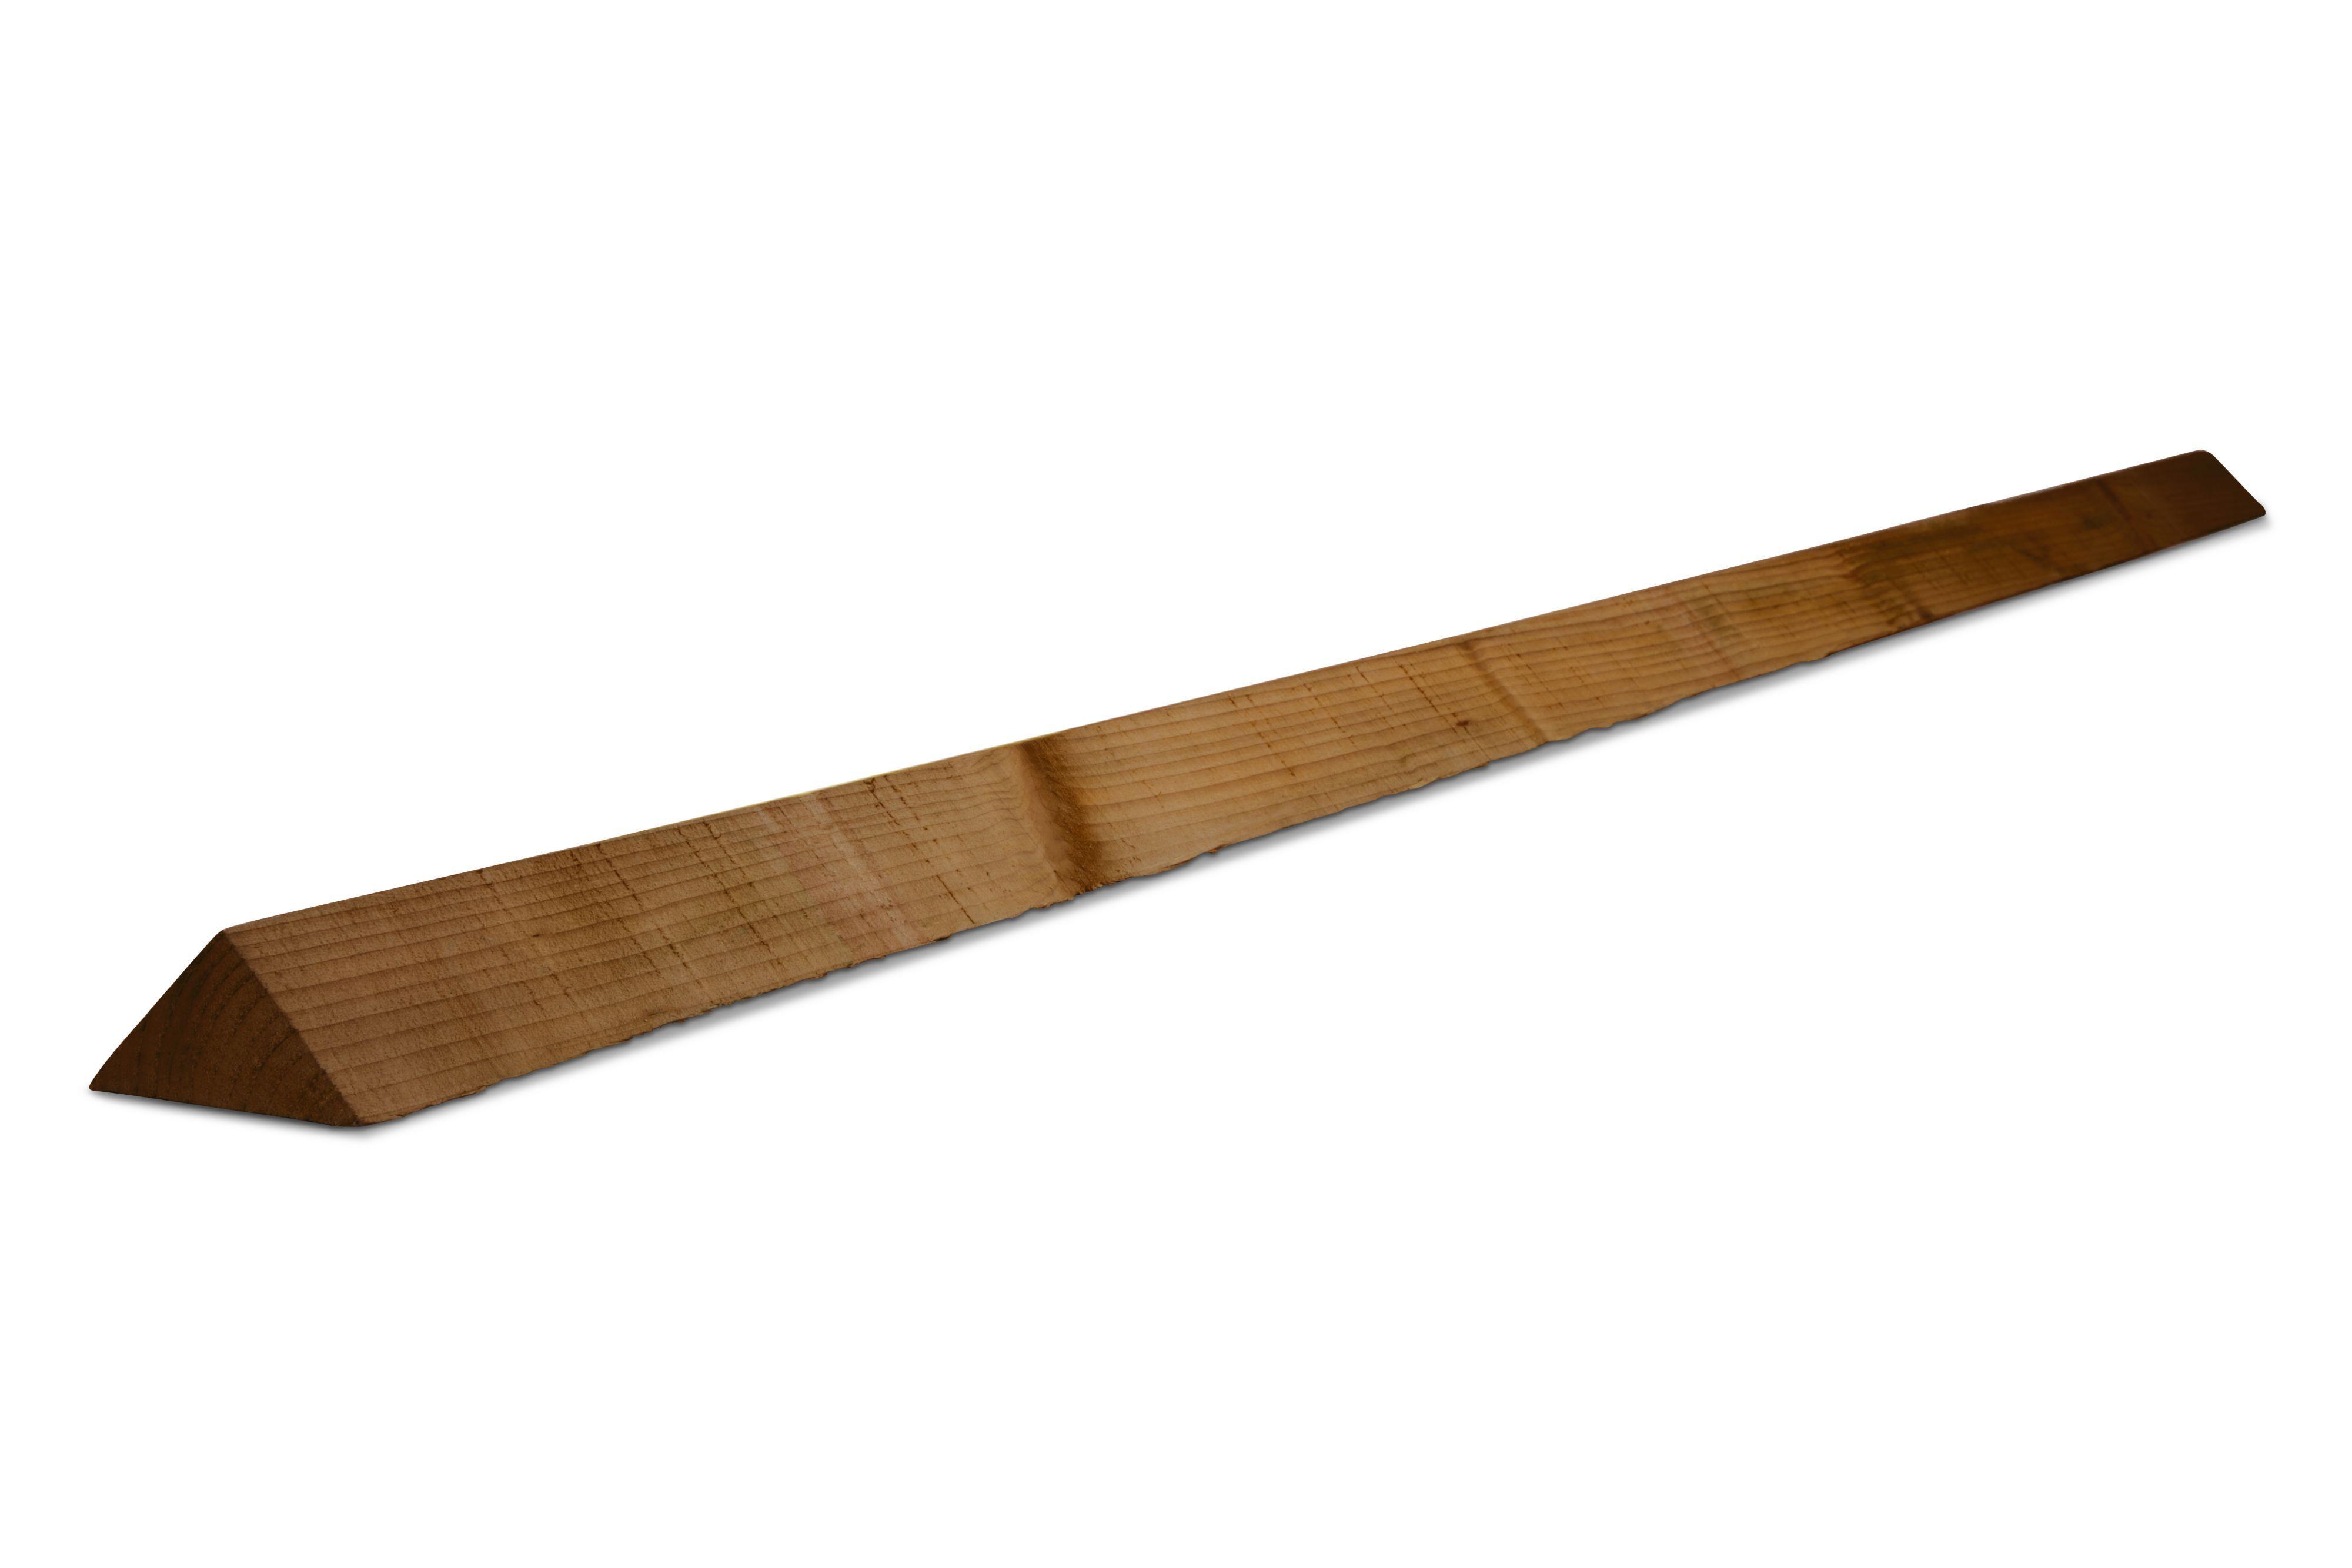 Rough Sawn Spruce Arris Rail (l)2400mm (t)37.5mm